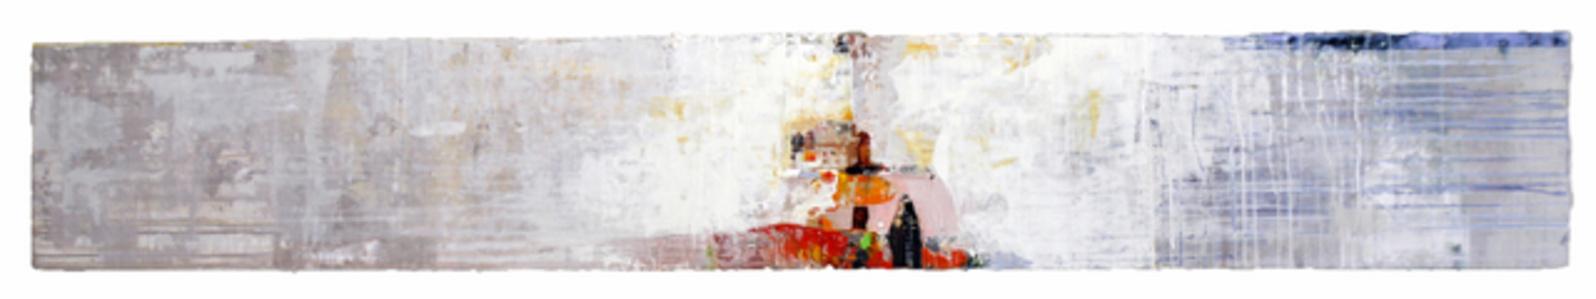 Untitled (9.4.16)